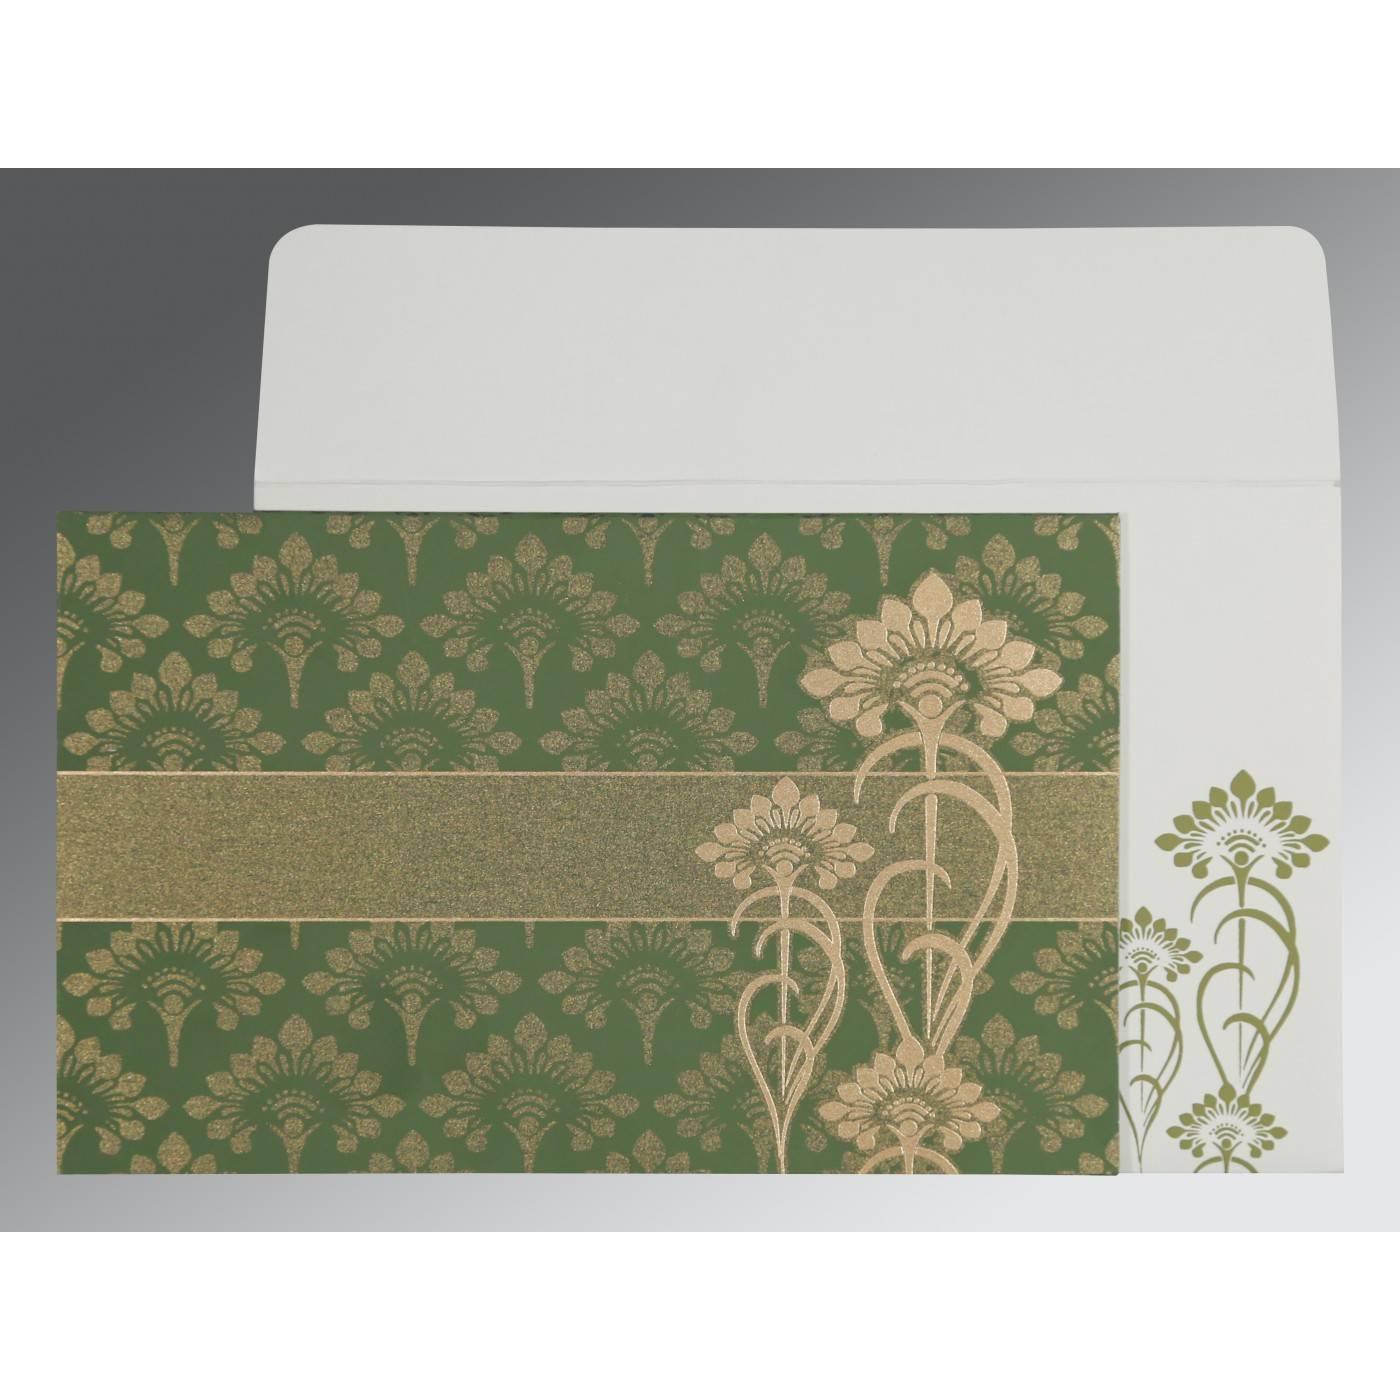 OLIVE GREEN SHIMMERY SCREEN PRINTED WEDDING CARD : CS-8239F - IndianWeddingCards